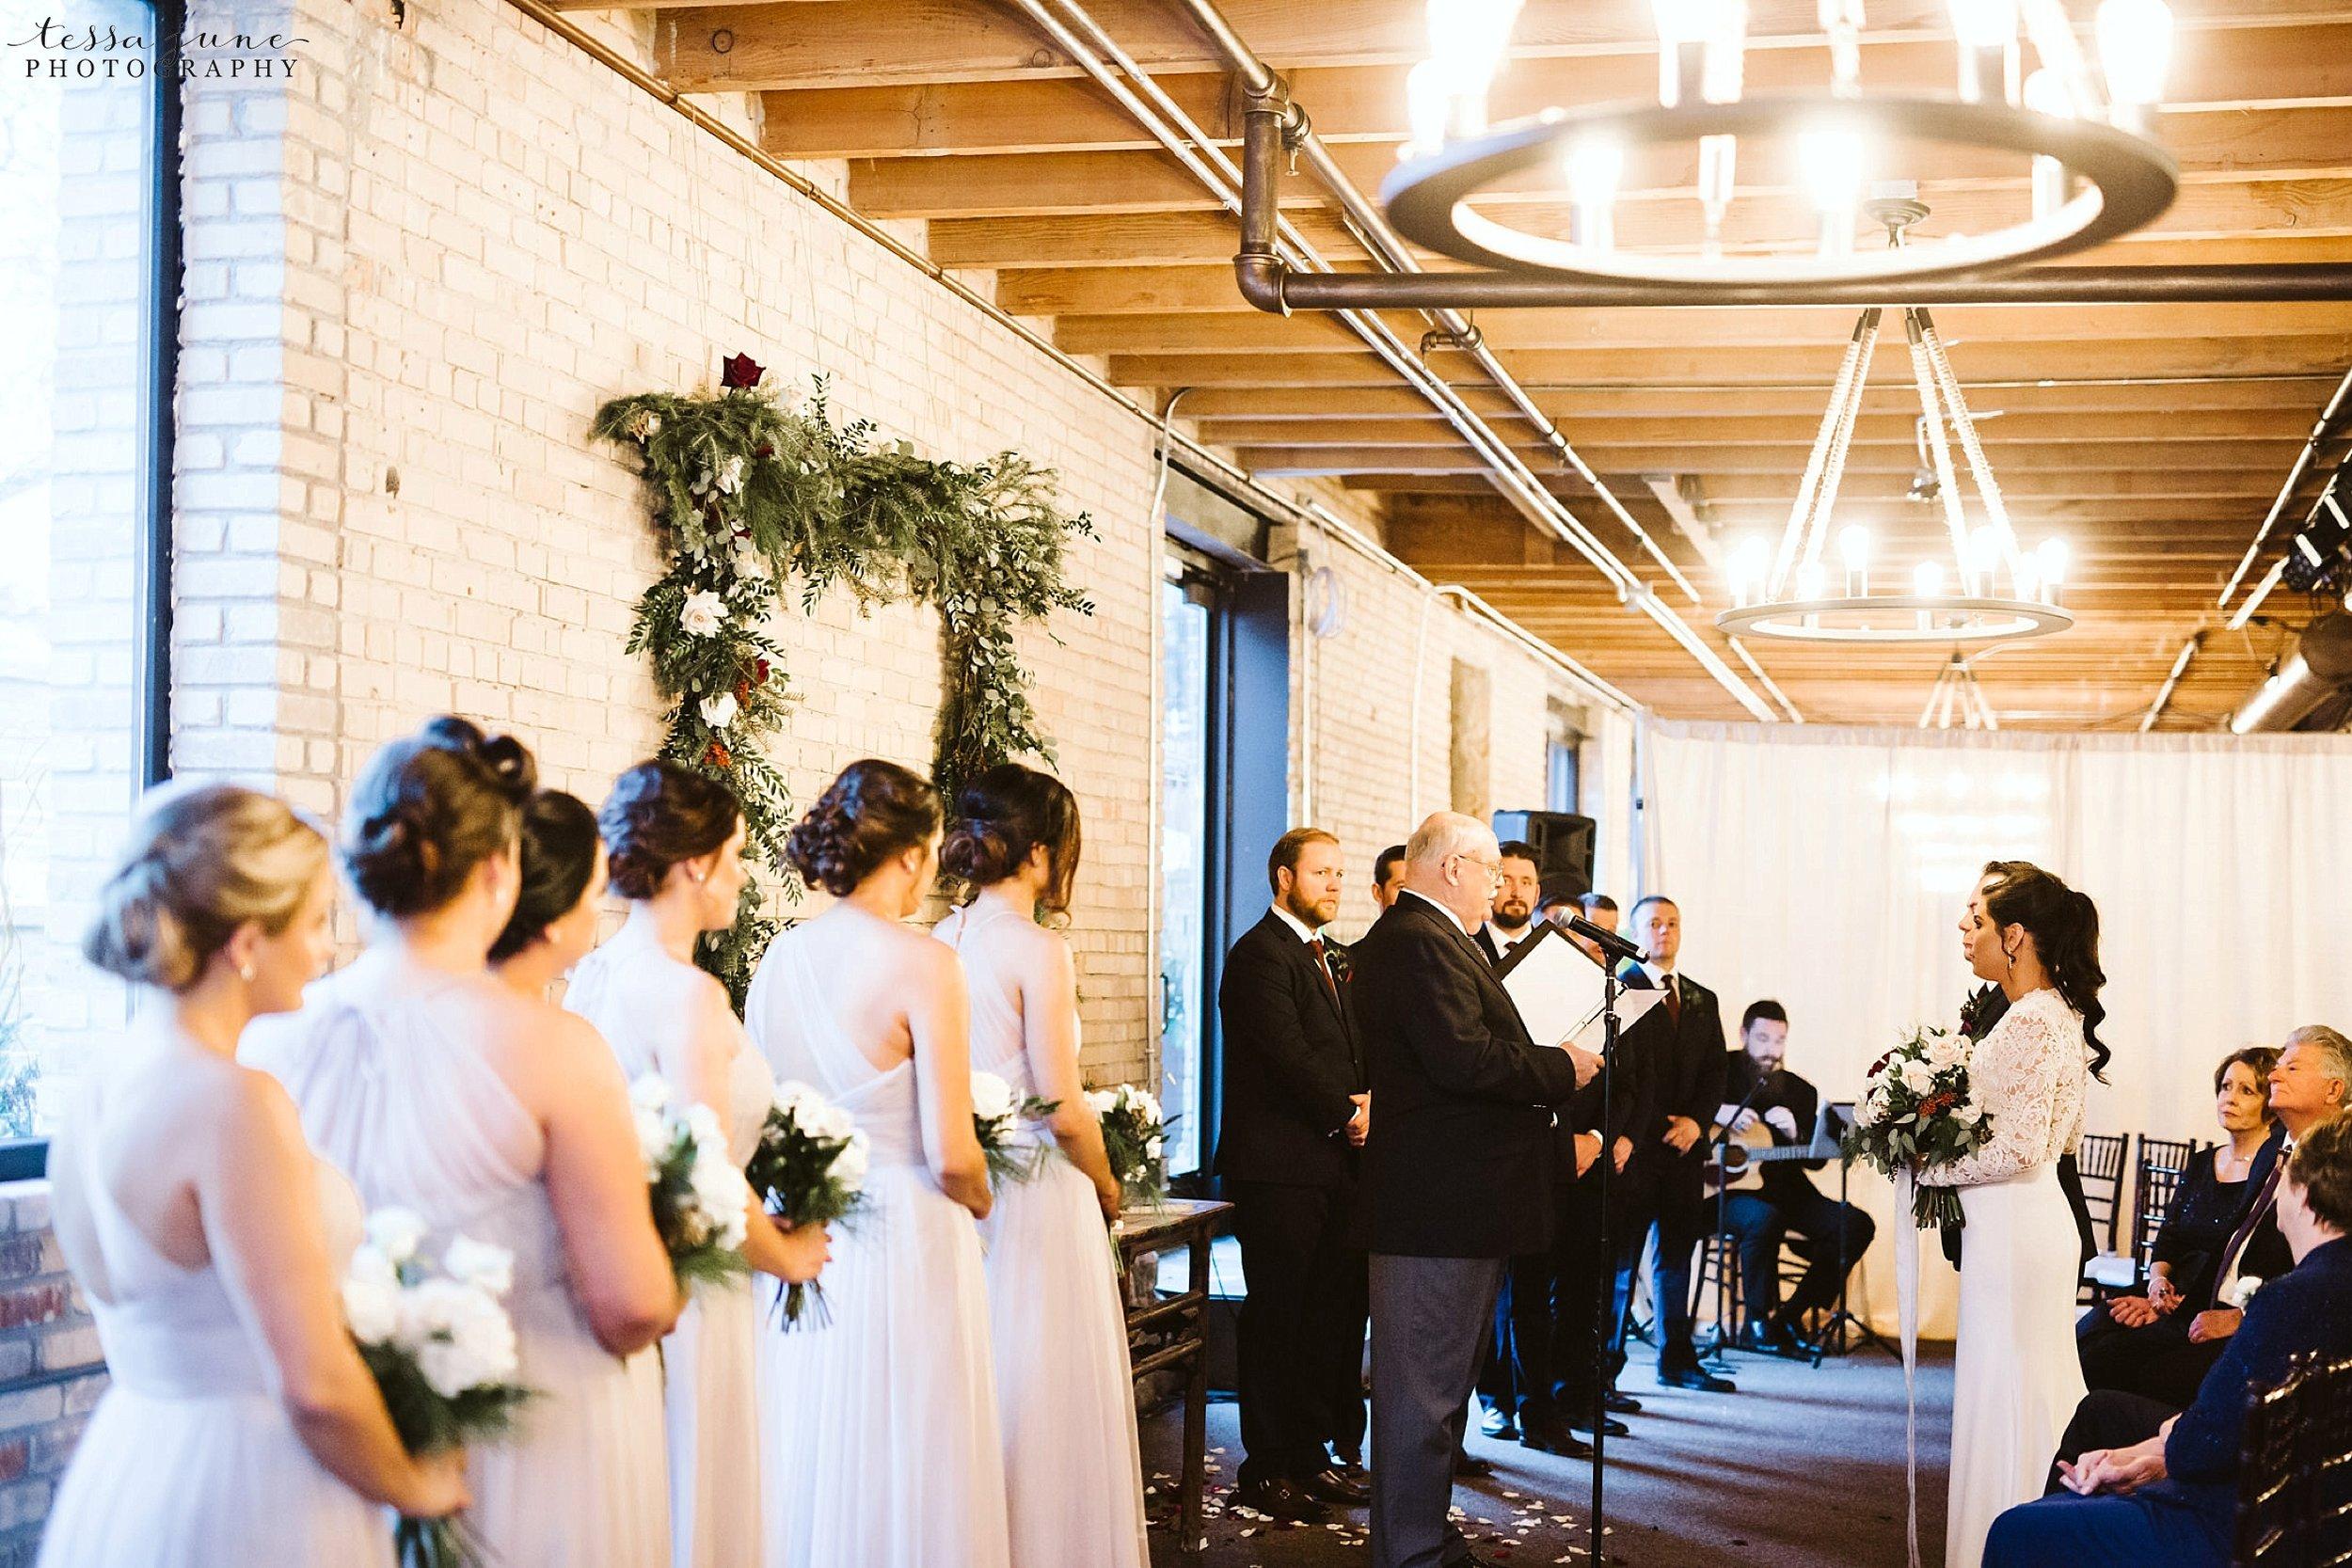 minneapolis-event-center-winter-romantic-snow-wedding-december-147.jpg